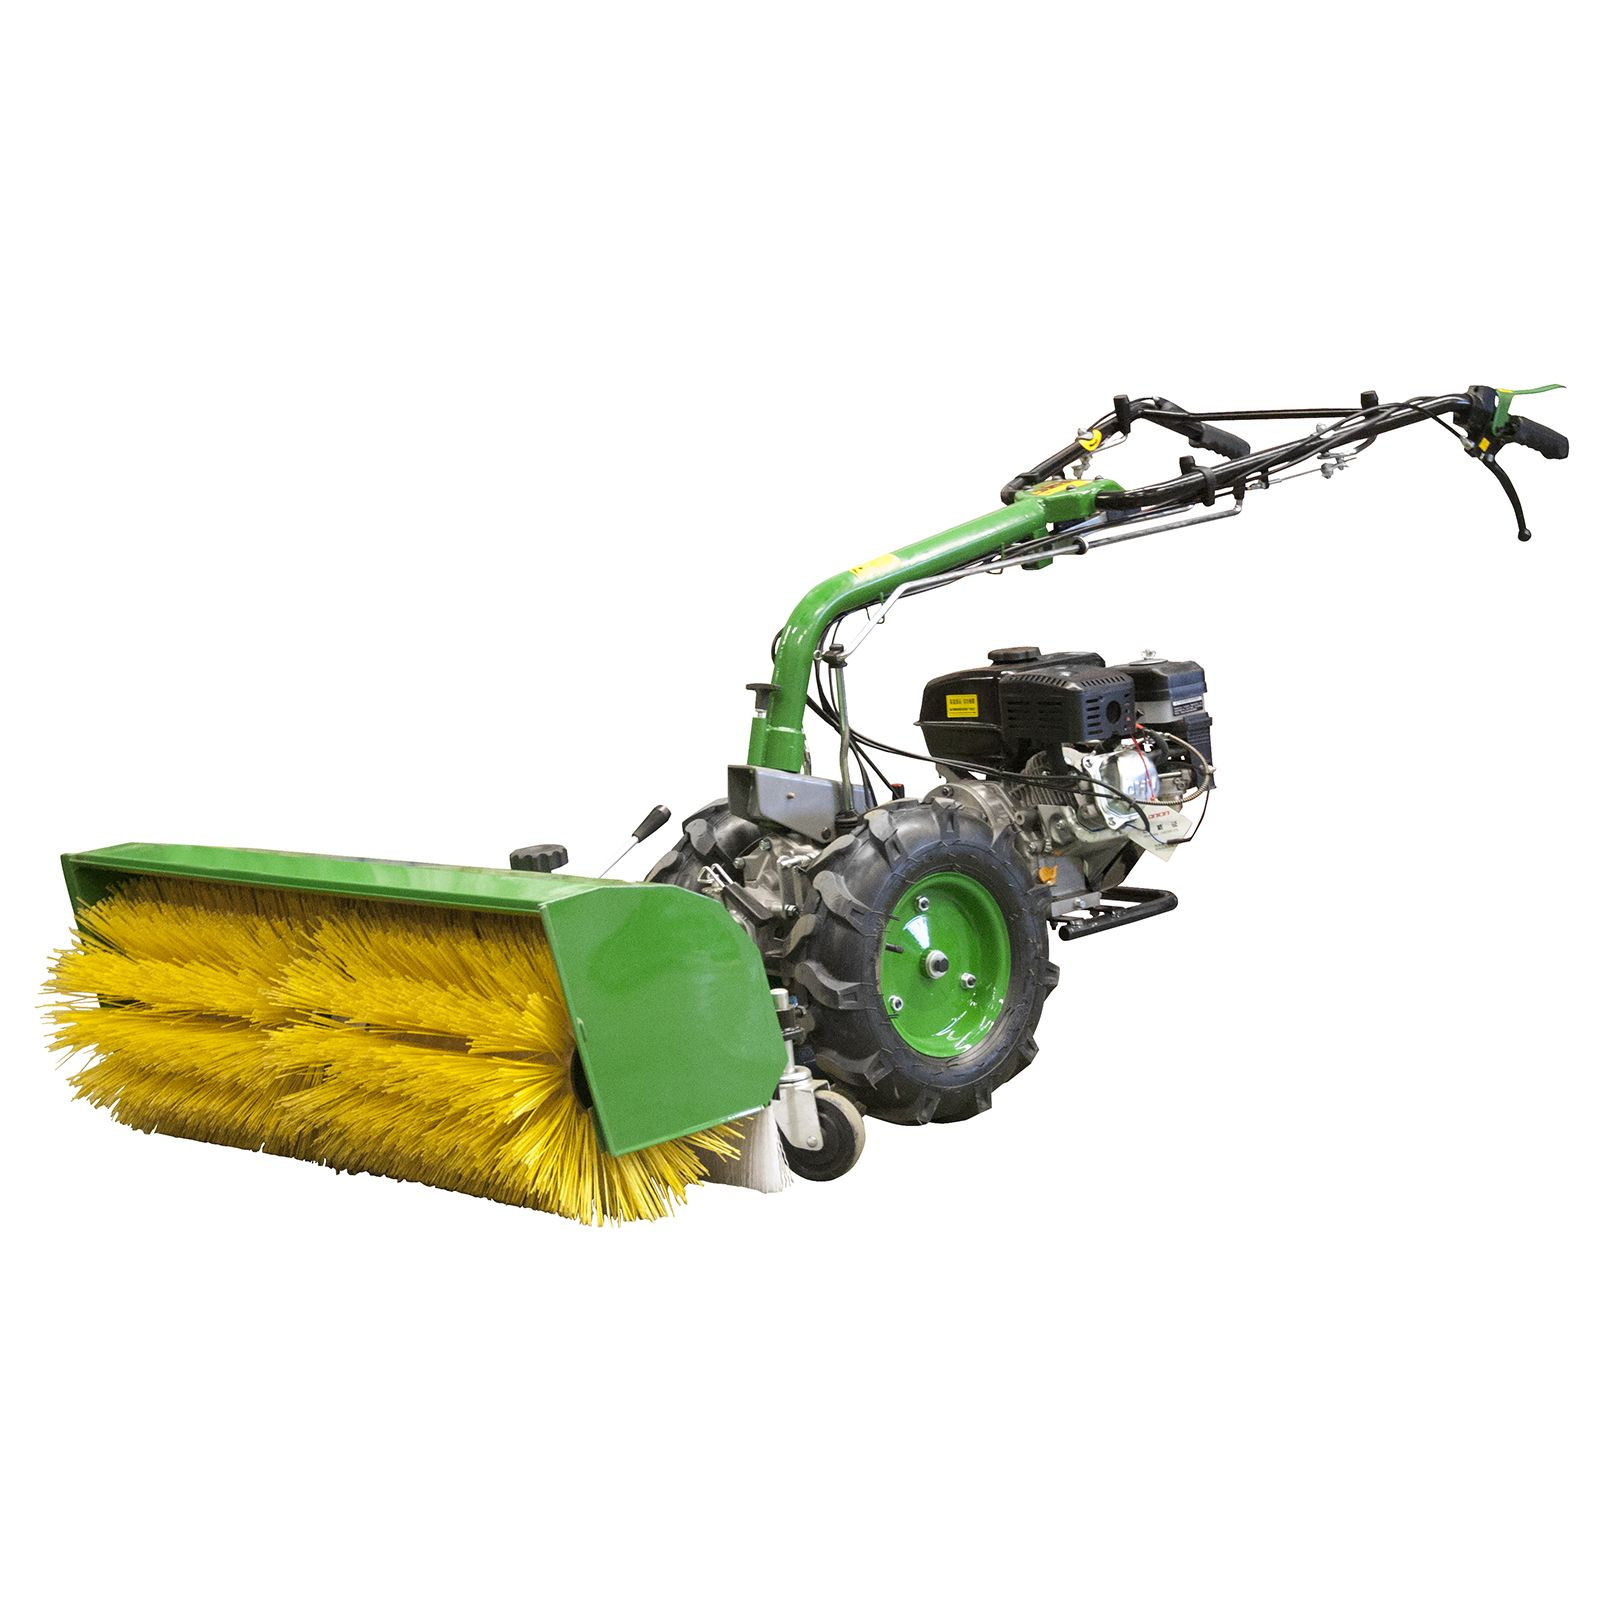 MultiMachine SweeperLearn More